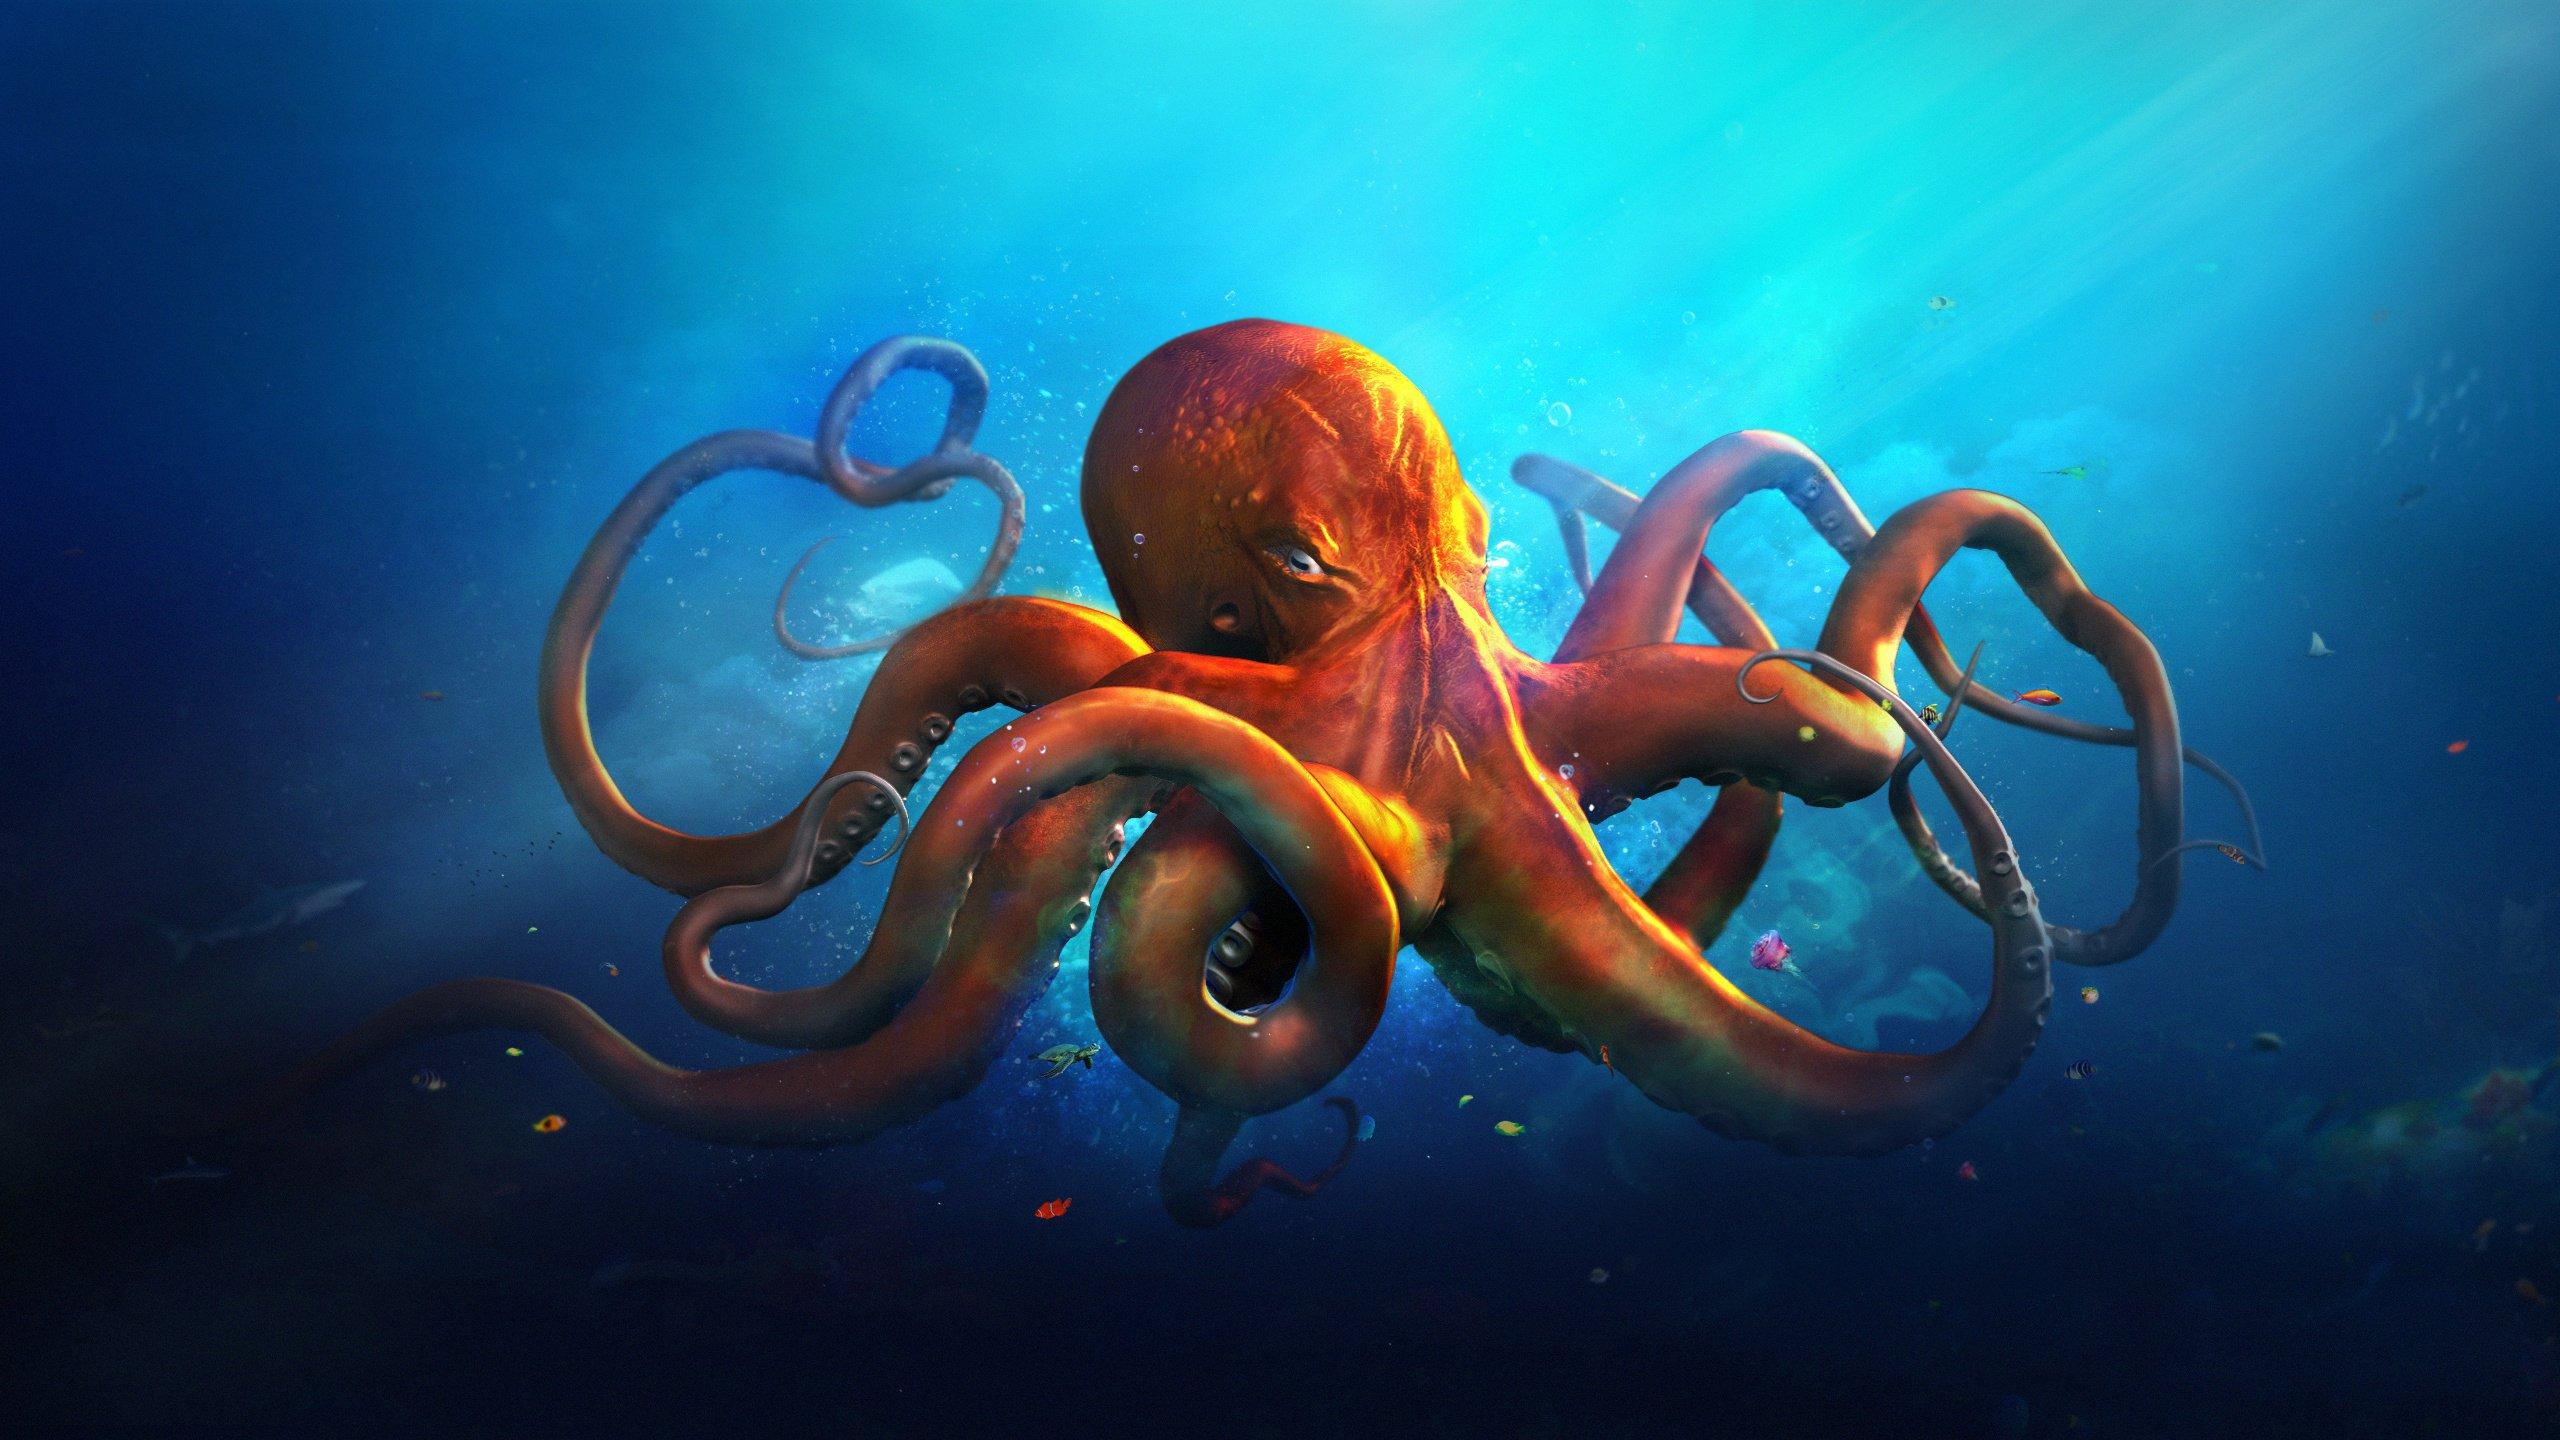 Animals octopus ocean sea fantasy artwork art wallpaper background 2560x1440